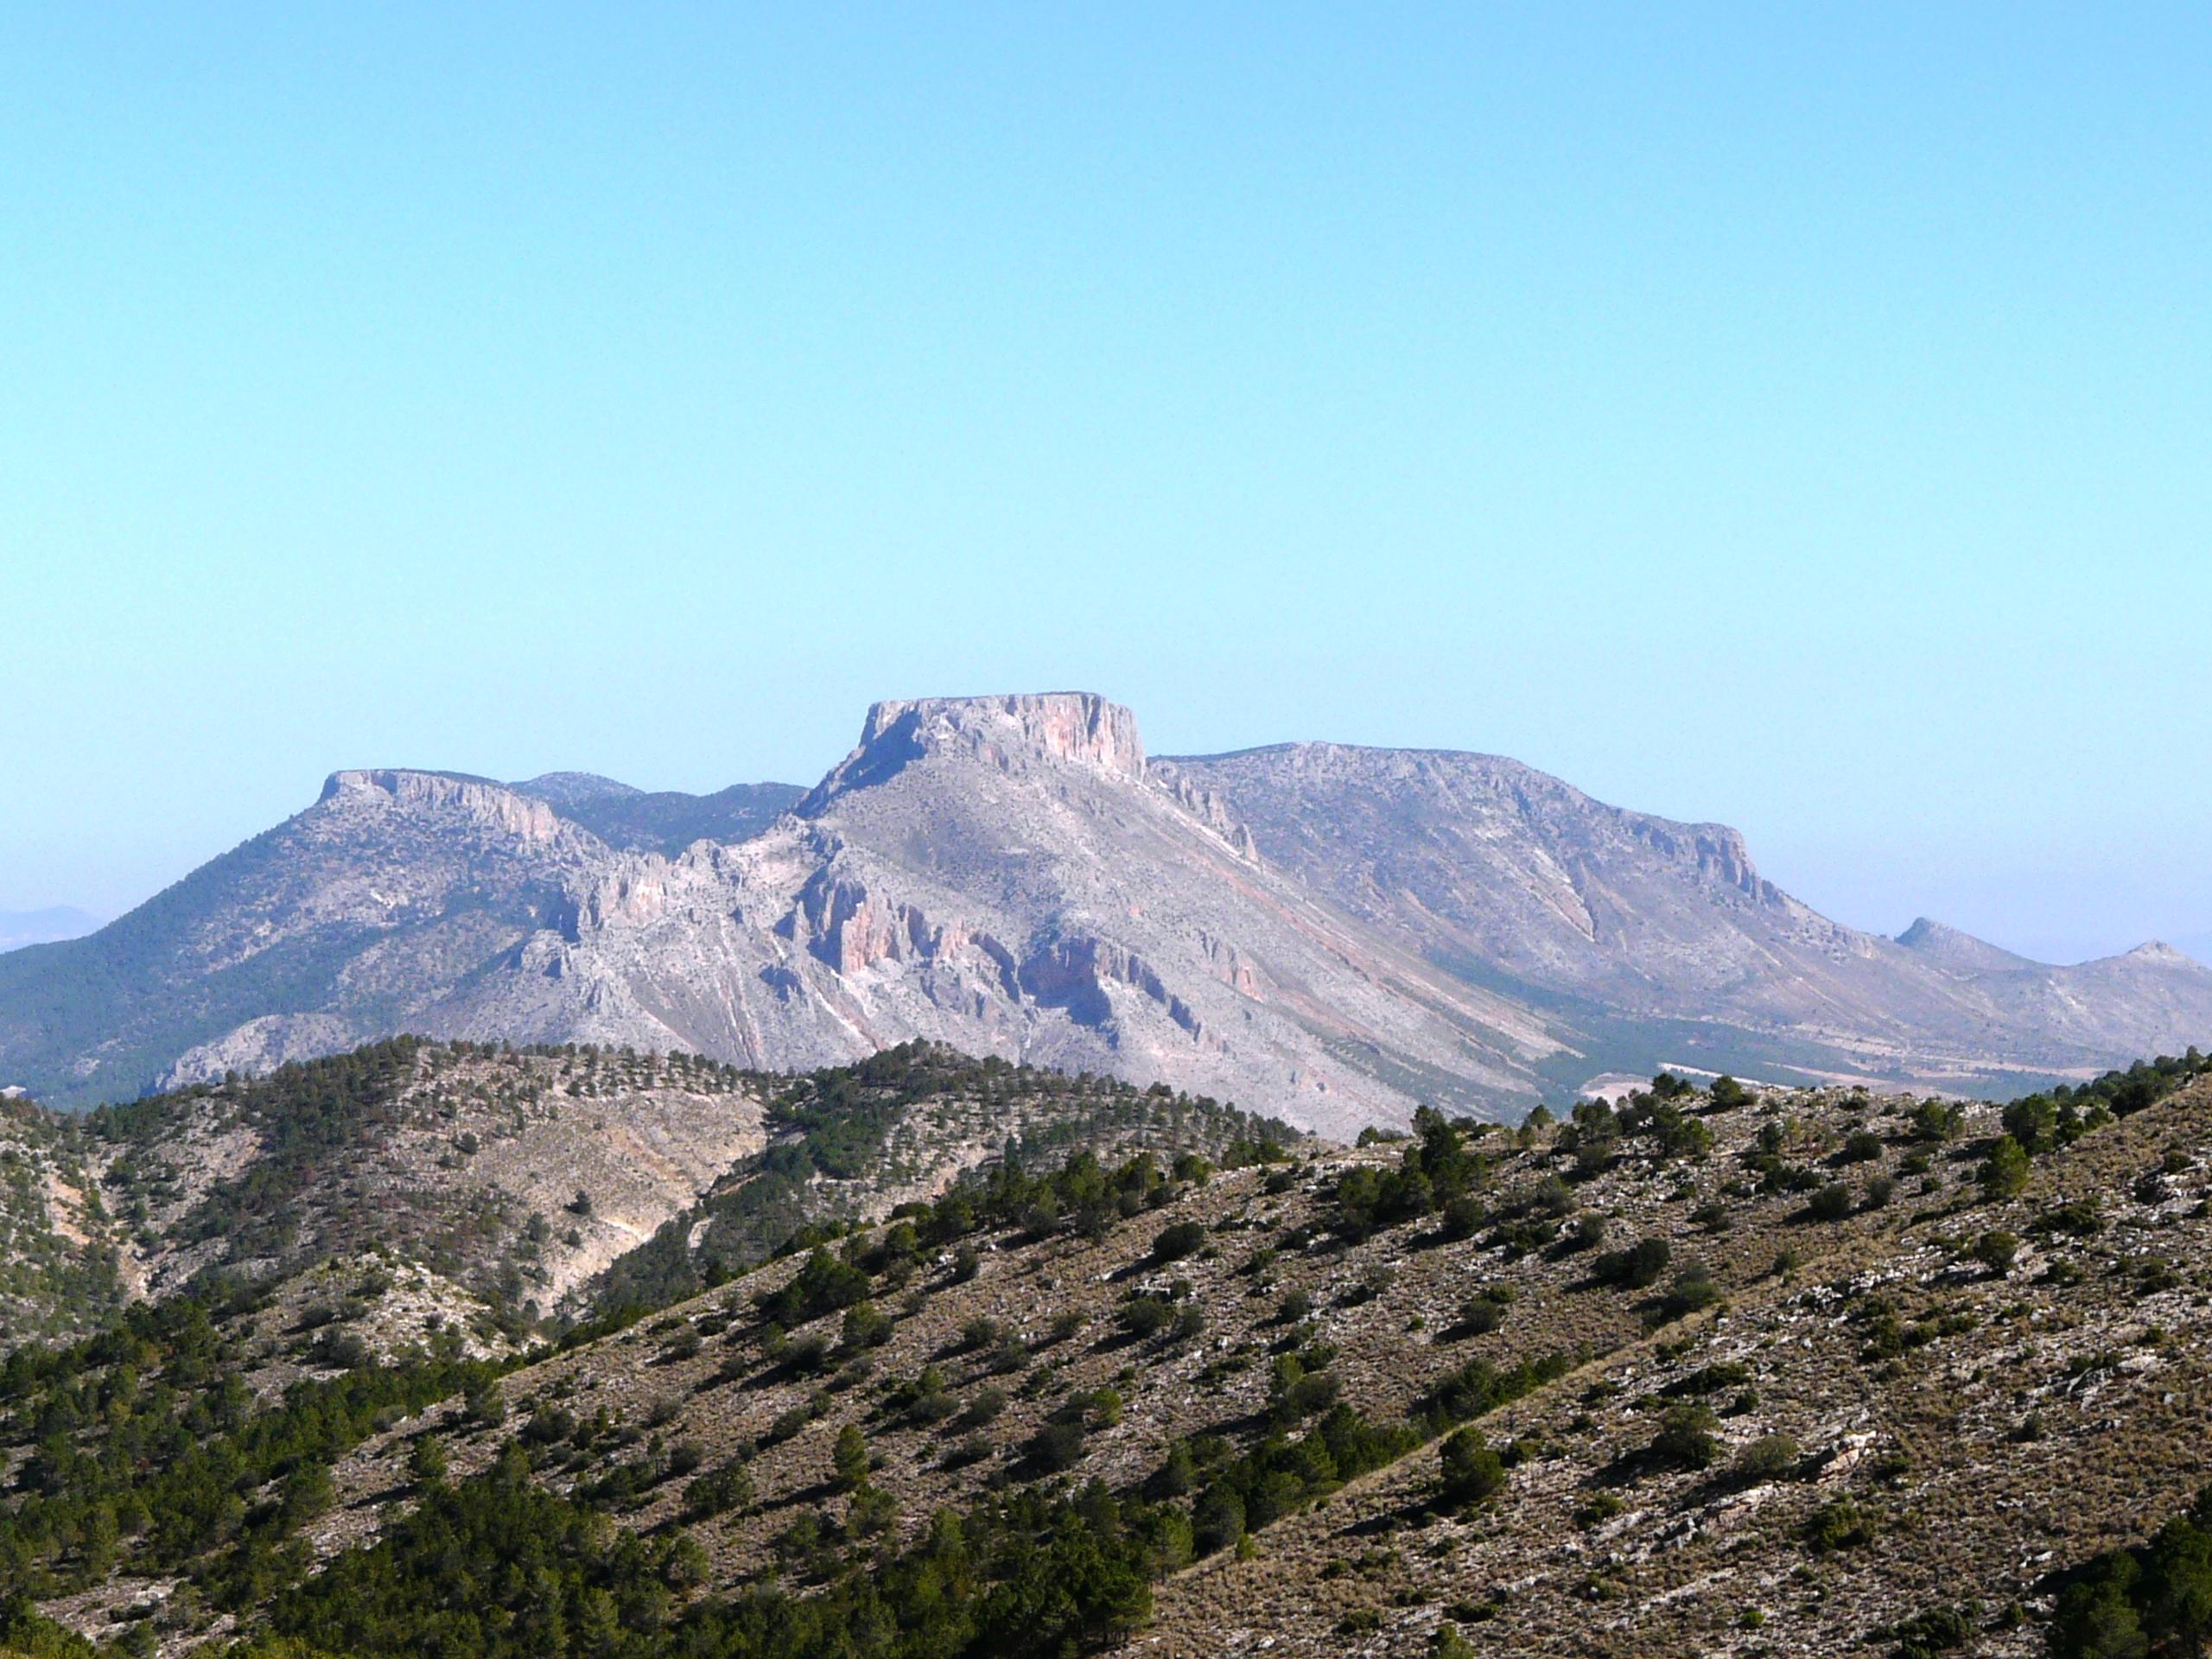 La Muela Mountain